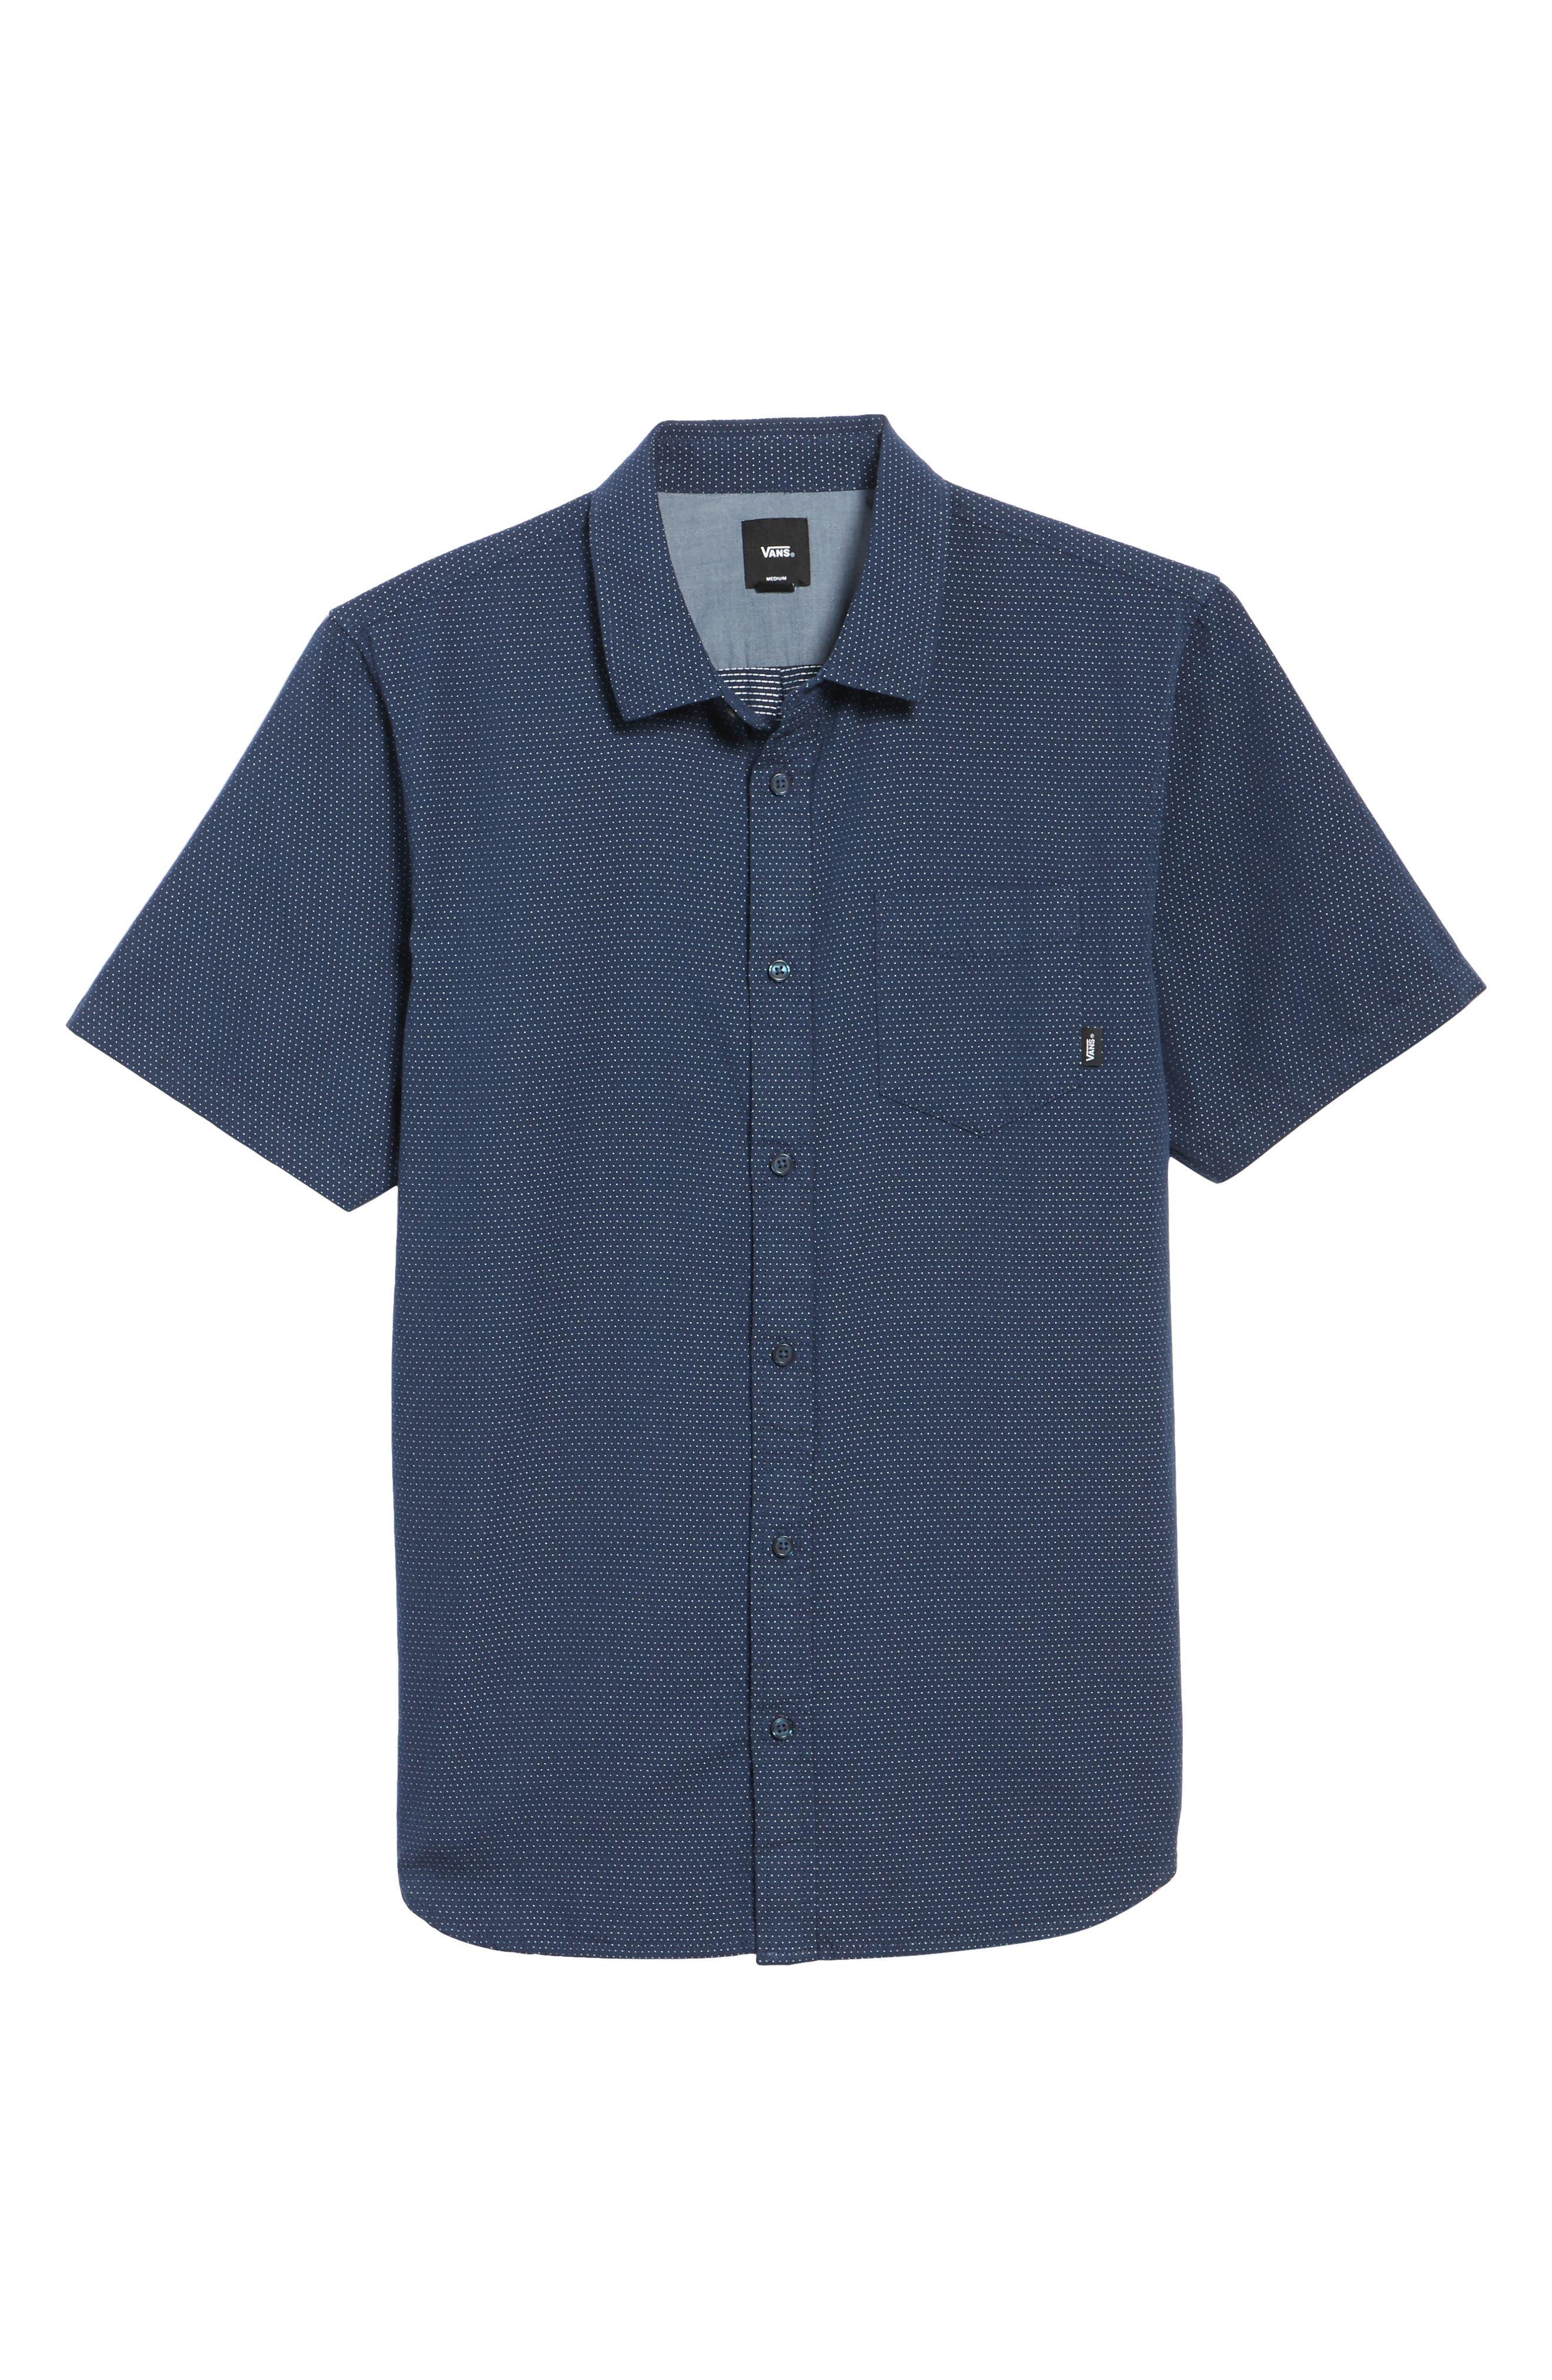 Giddings Short Sleeve Shirt,                             Alternate thumbnail 6, color,                             Dress Blues